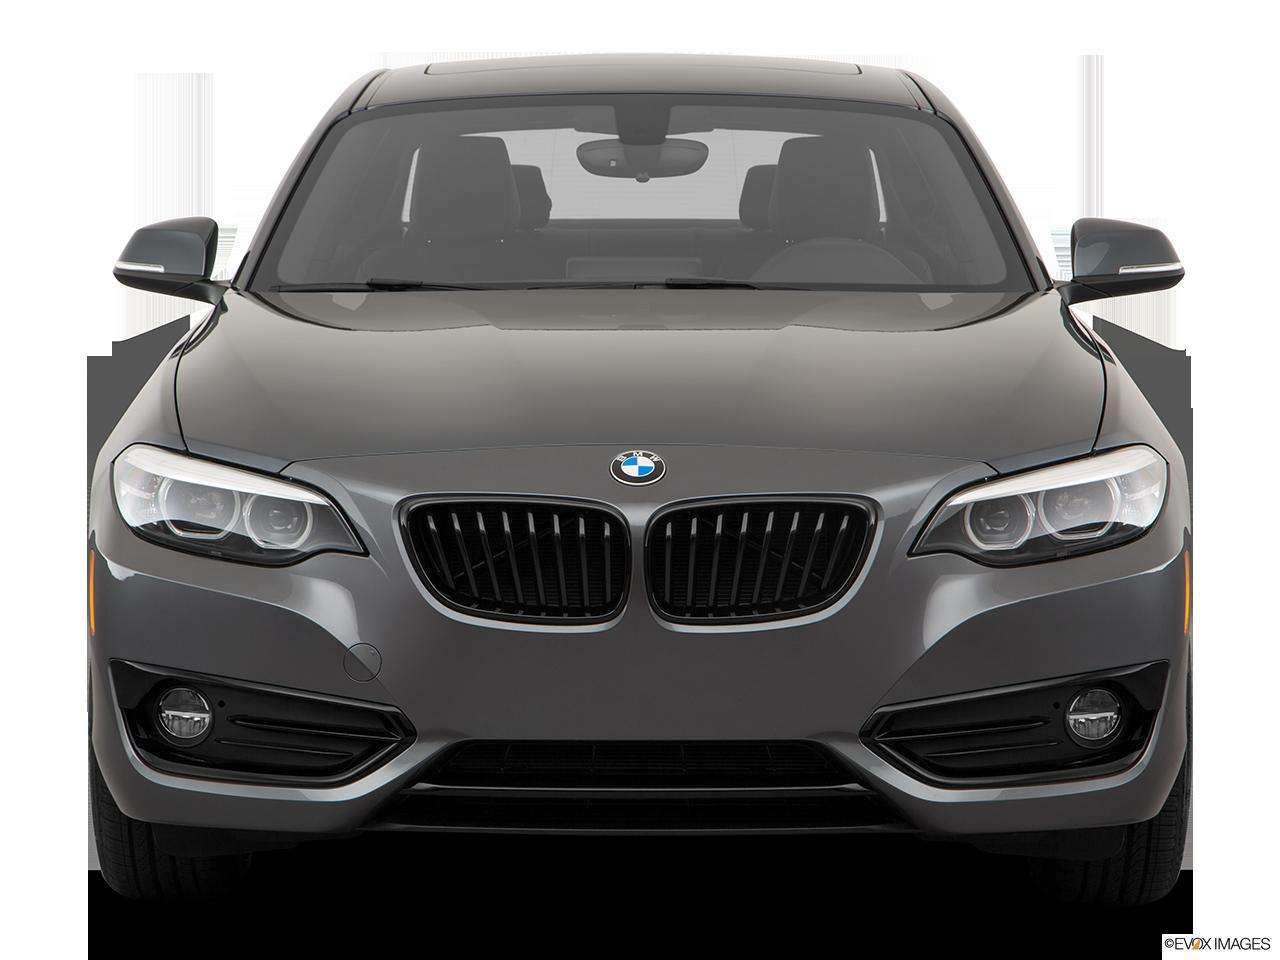 2020 BMW 2 Series photo